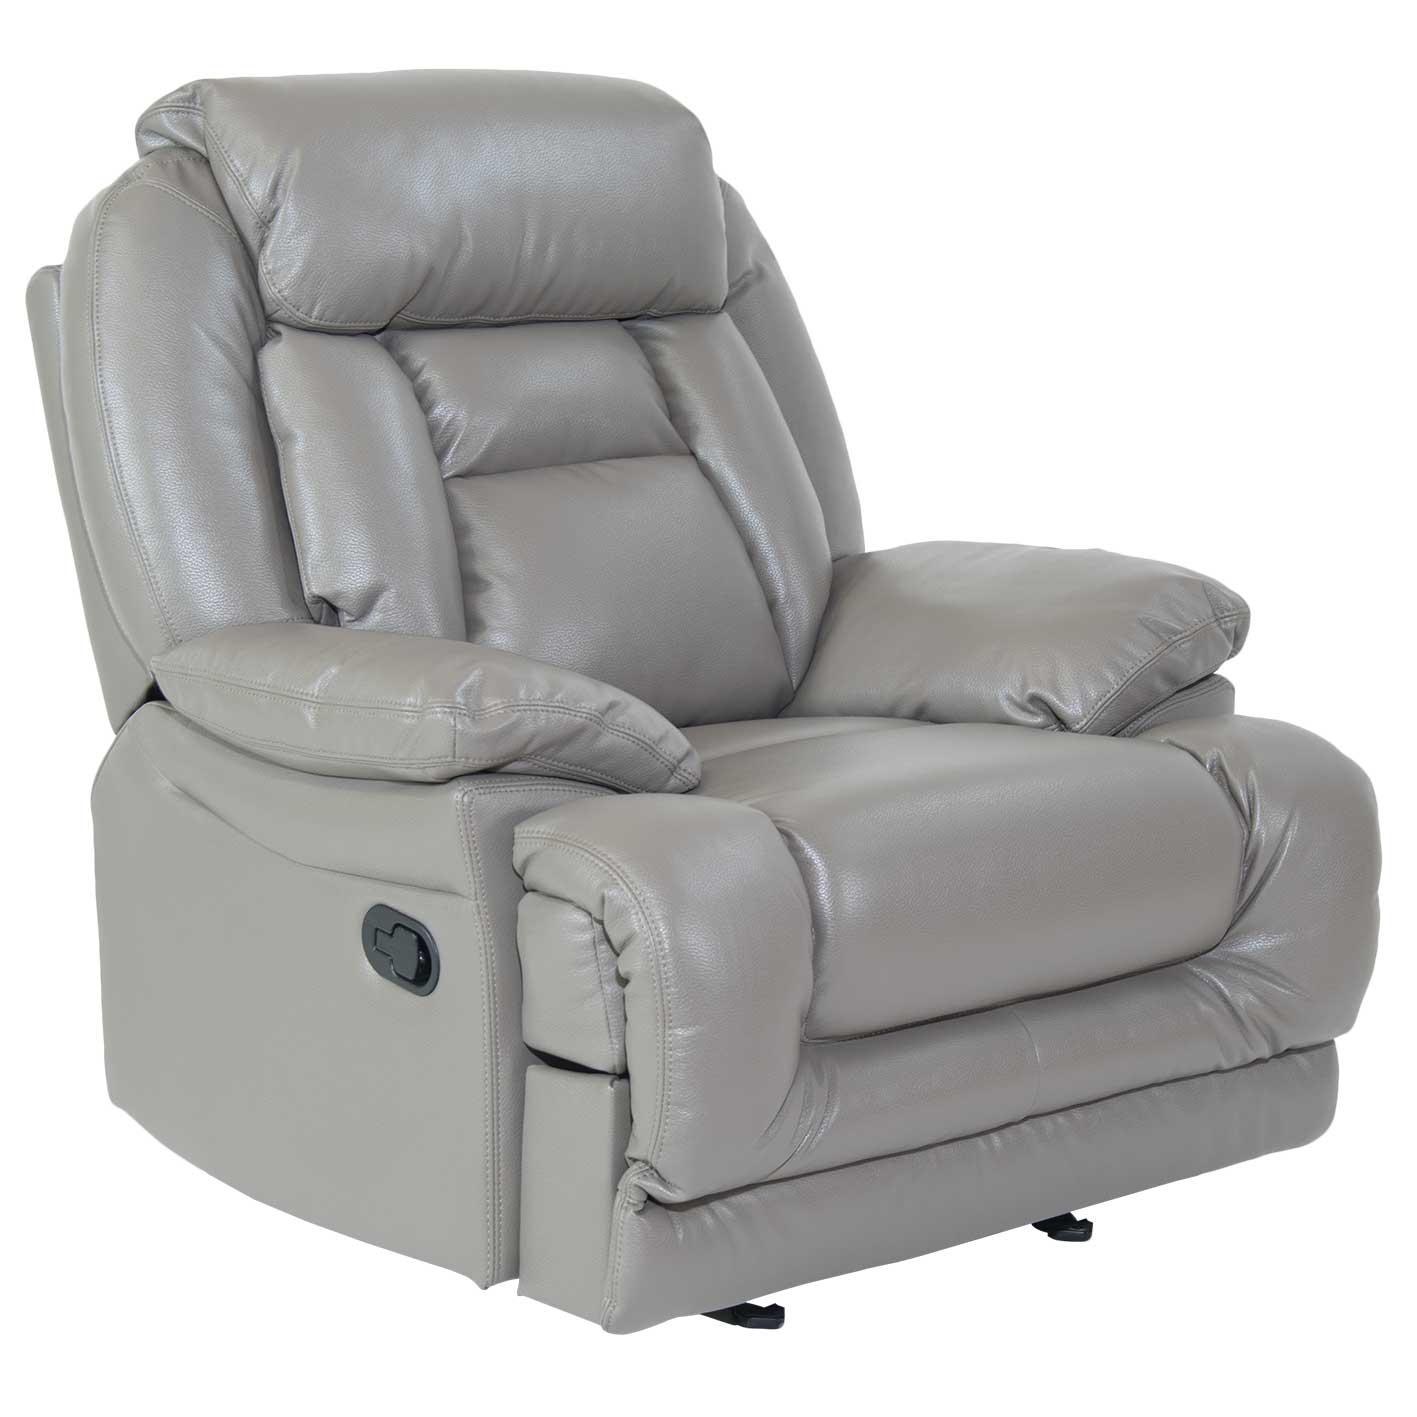 Zhej03 Recliner Lounge Suite Furniture Liquidation Warehouse